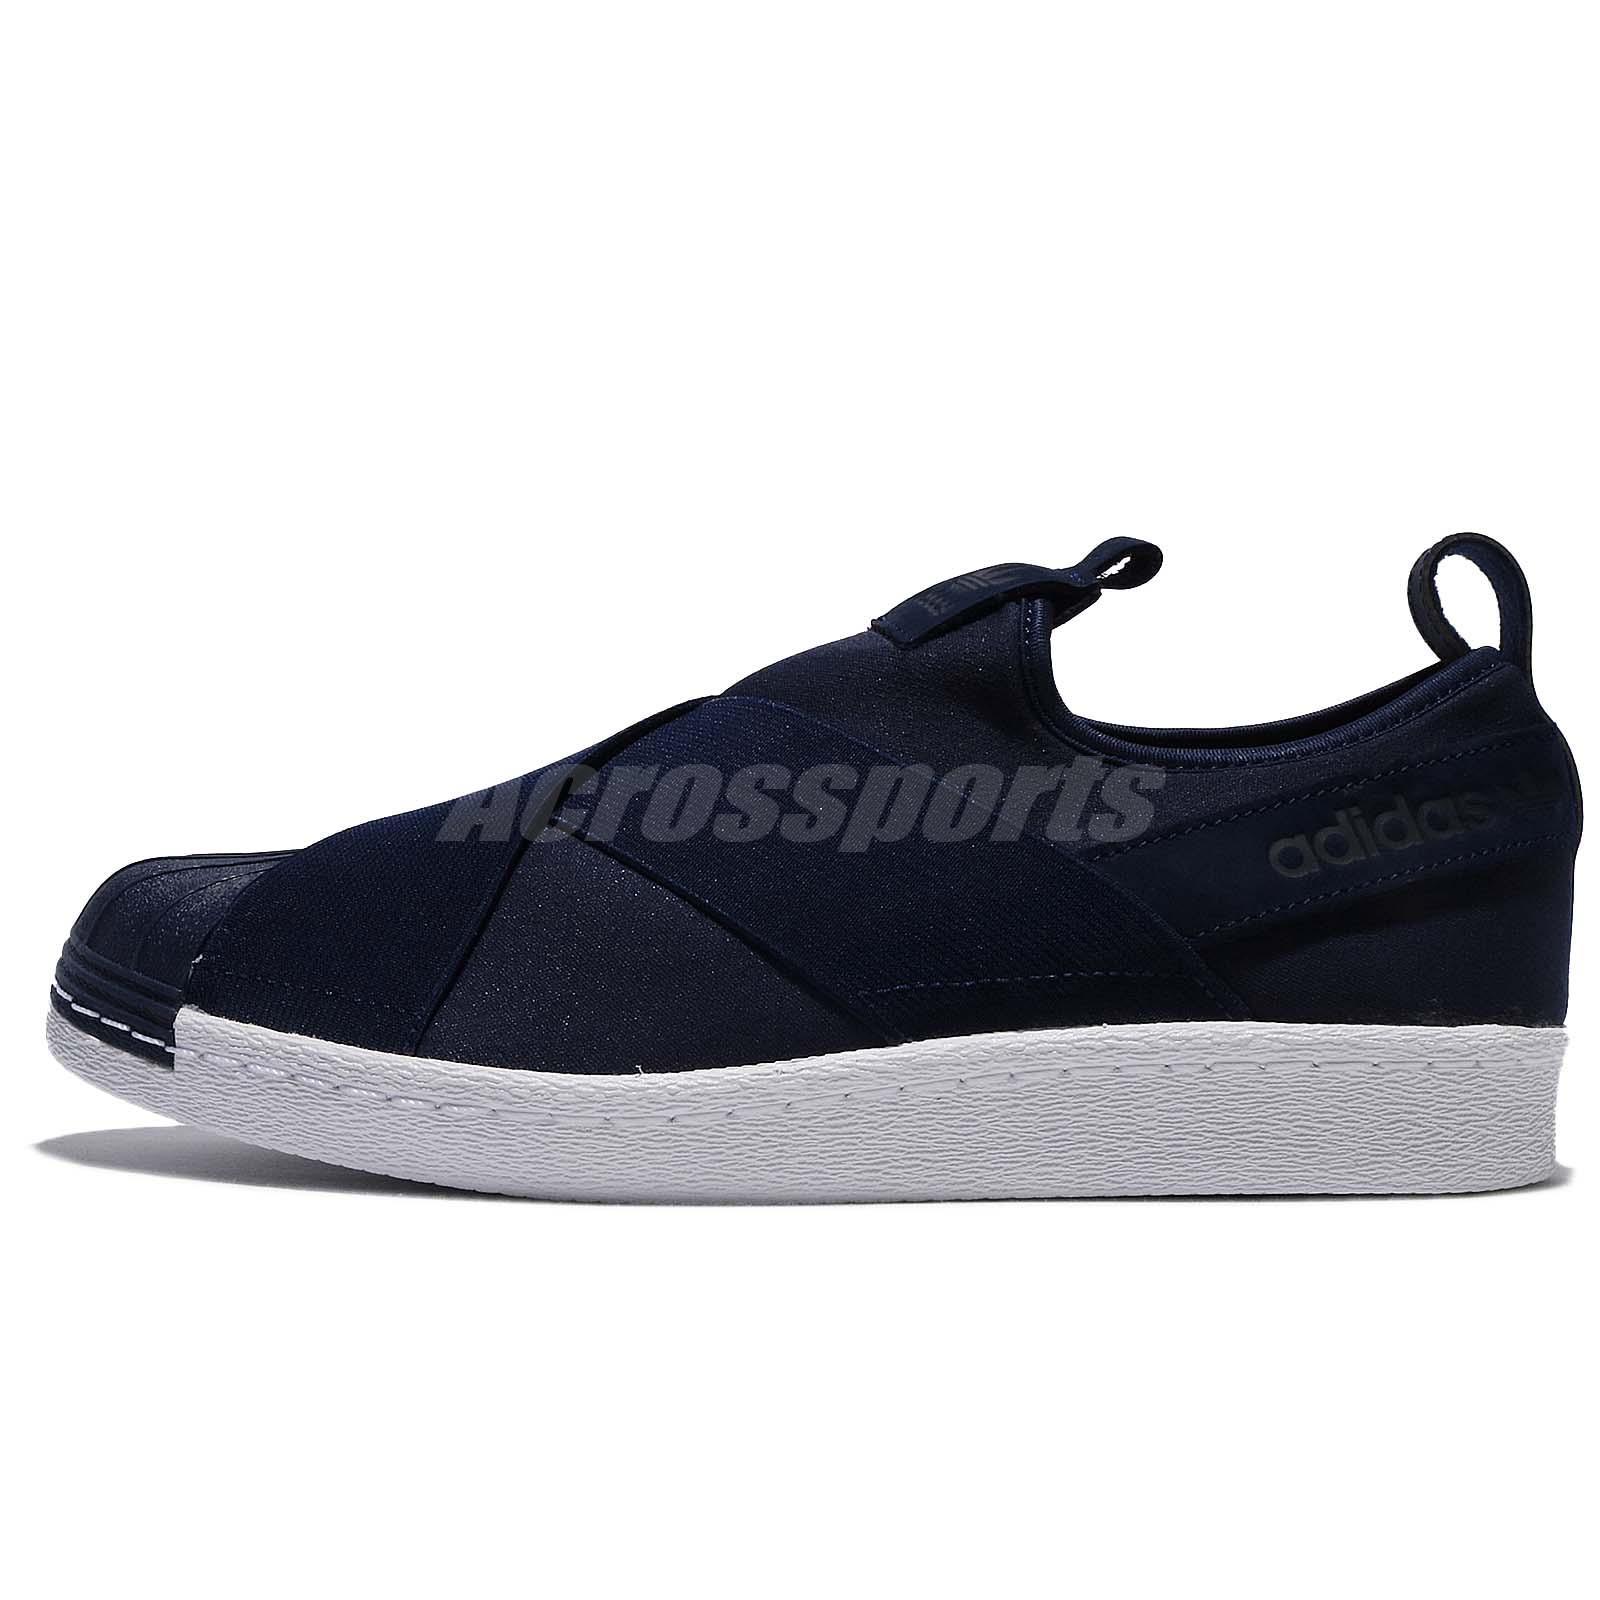 Adidas Superstar Slipon Bianco Blu Marina Originali Uomini Scarpe Da Ginnastica